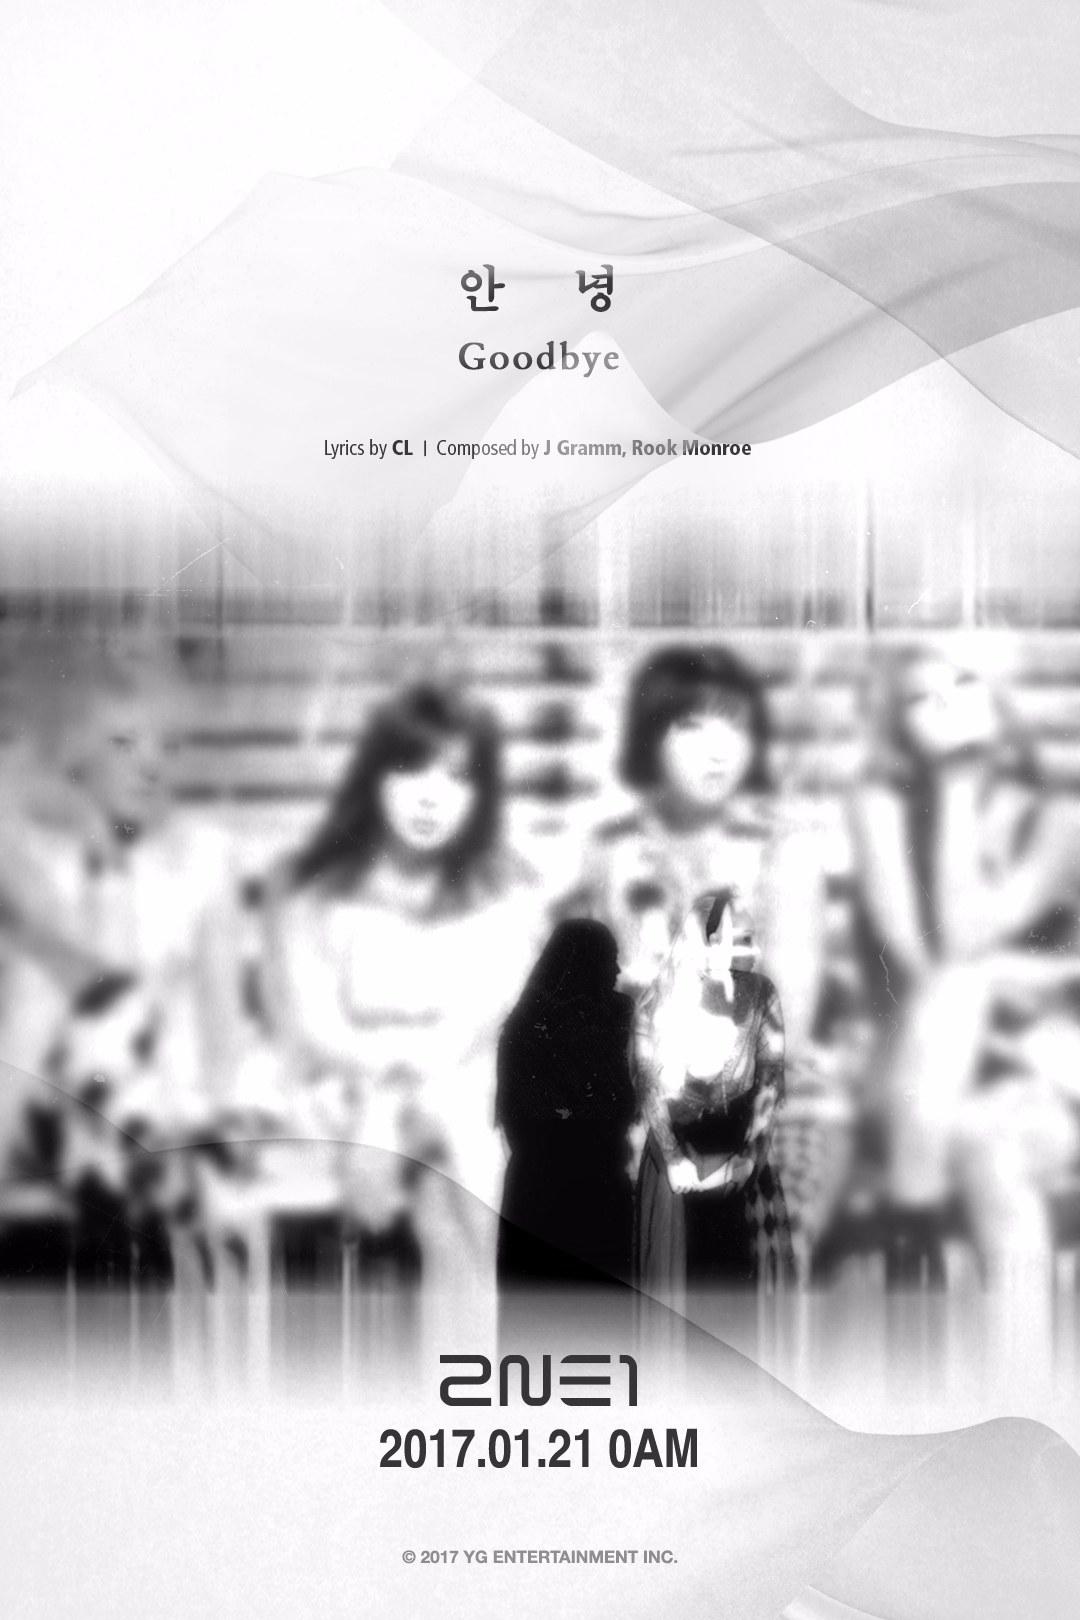 YG娛樂宣布正式跟2NE1的粉絲們告別在1/21將發行告別單曲《Good Bye》就連宣傳照都超催淚,CL跟Dara站在2NE1四人投影照片前似乎意味著2NE1將從4人變成2人ㅠㅠㅠ